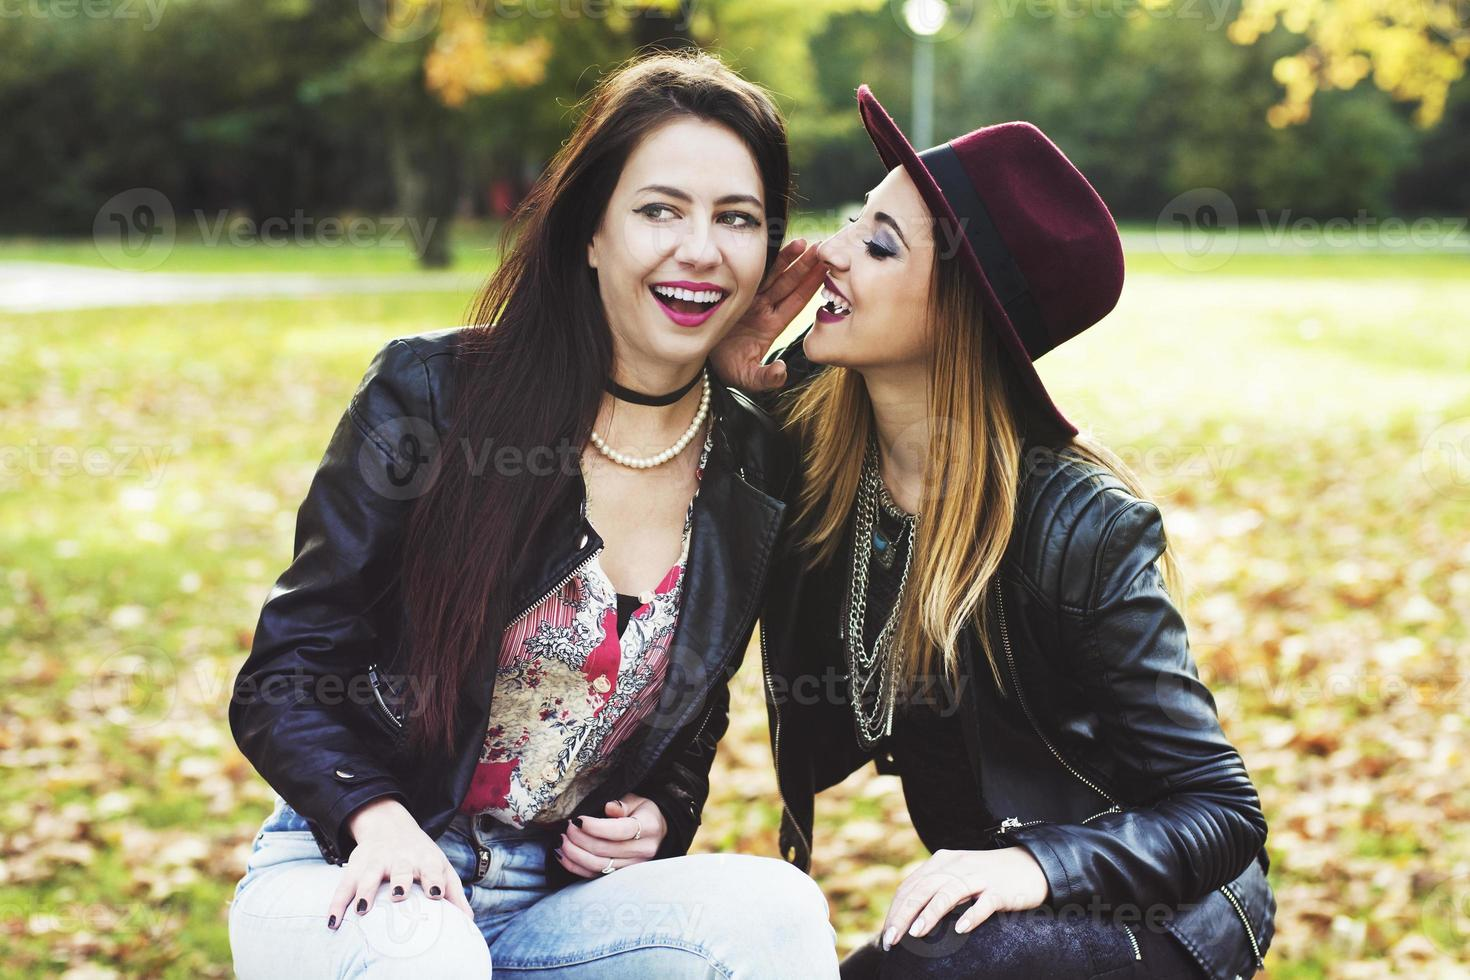 due ragazze in un parco su una panchina a ridere foto